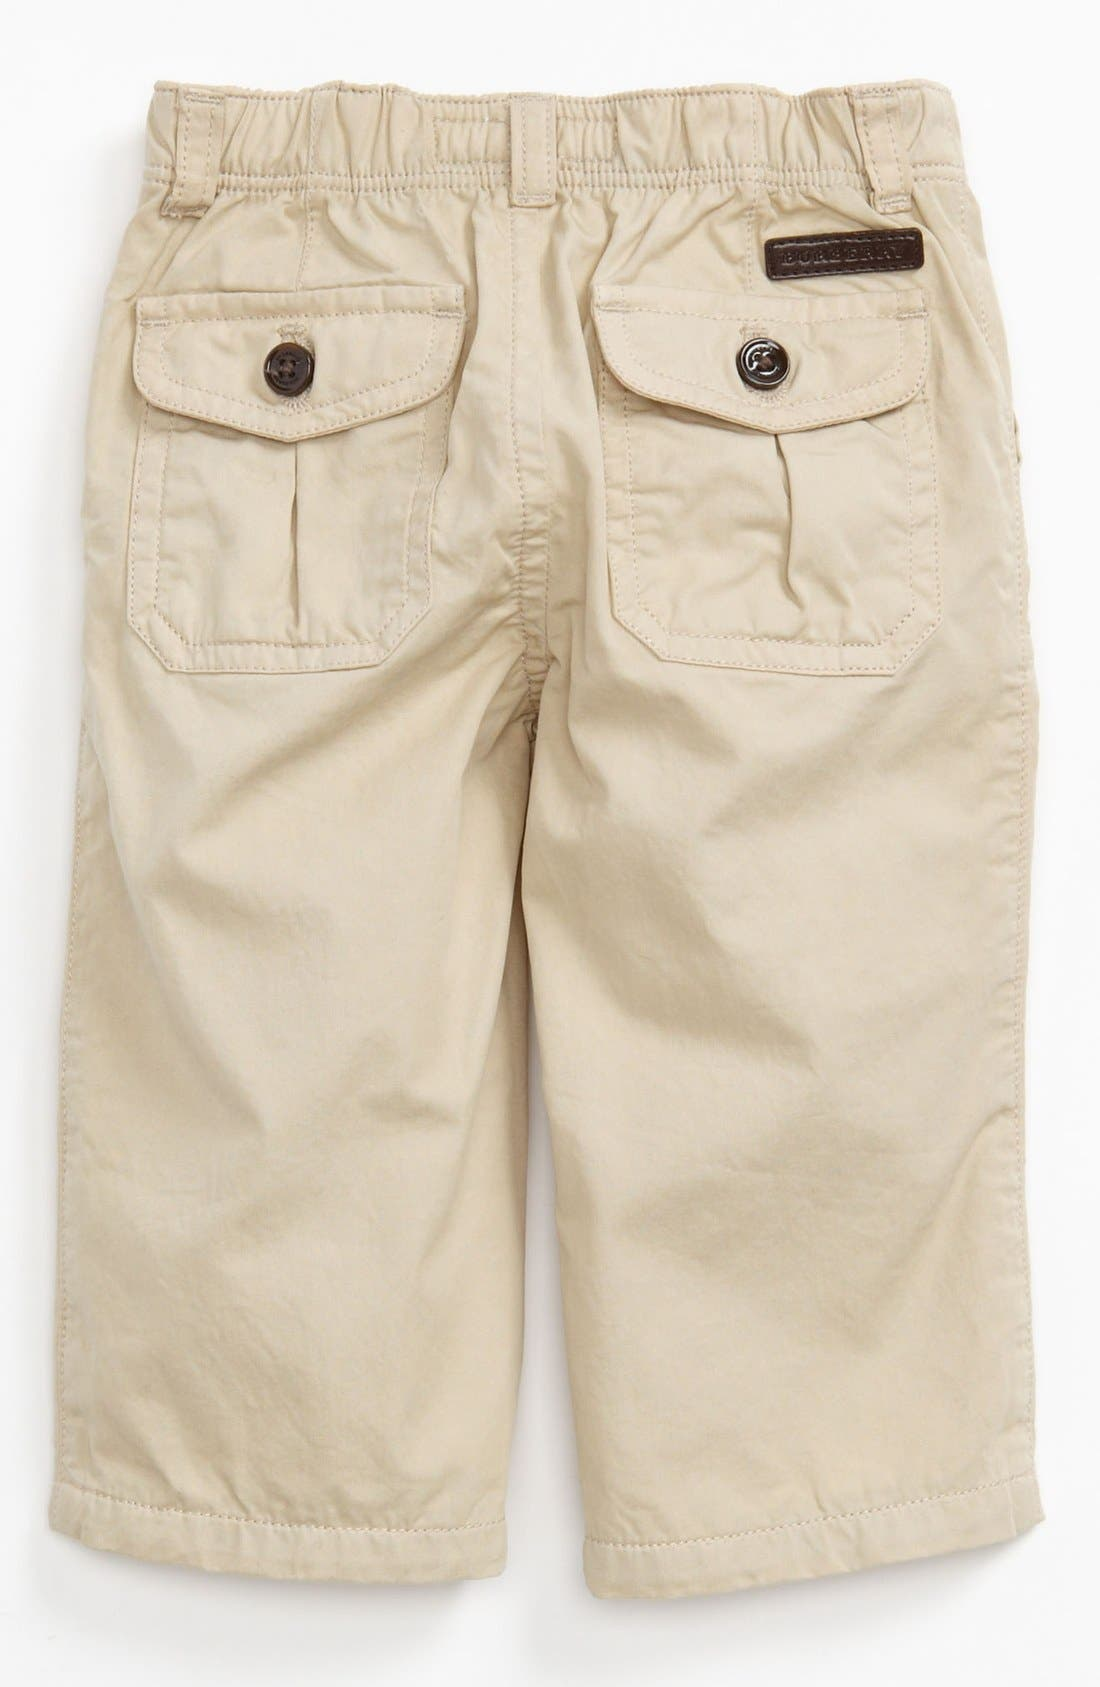 Alternate Image 1 Selected - Burberry Dress Pants (Toddler Boys)